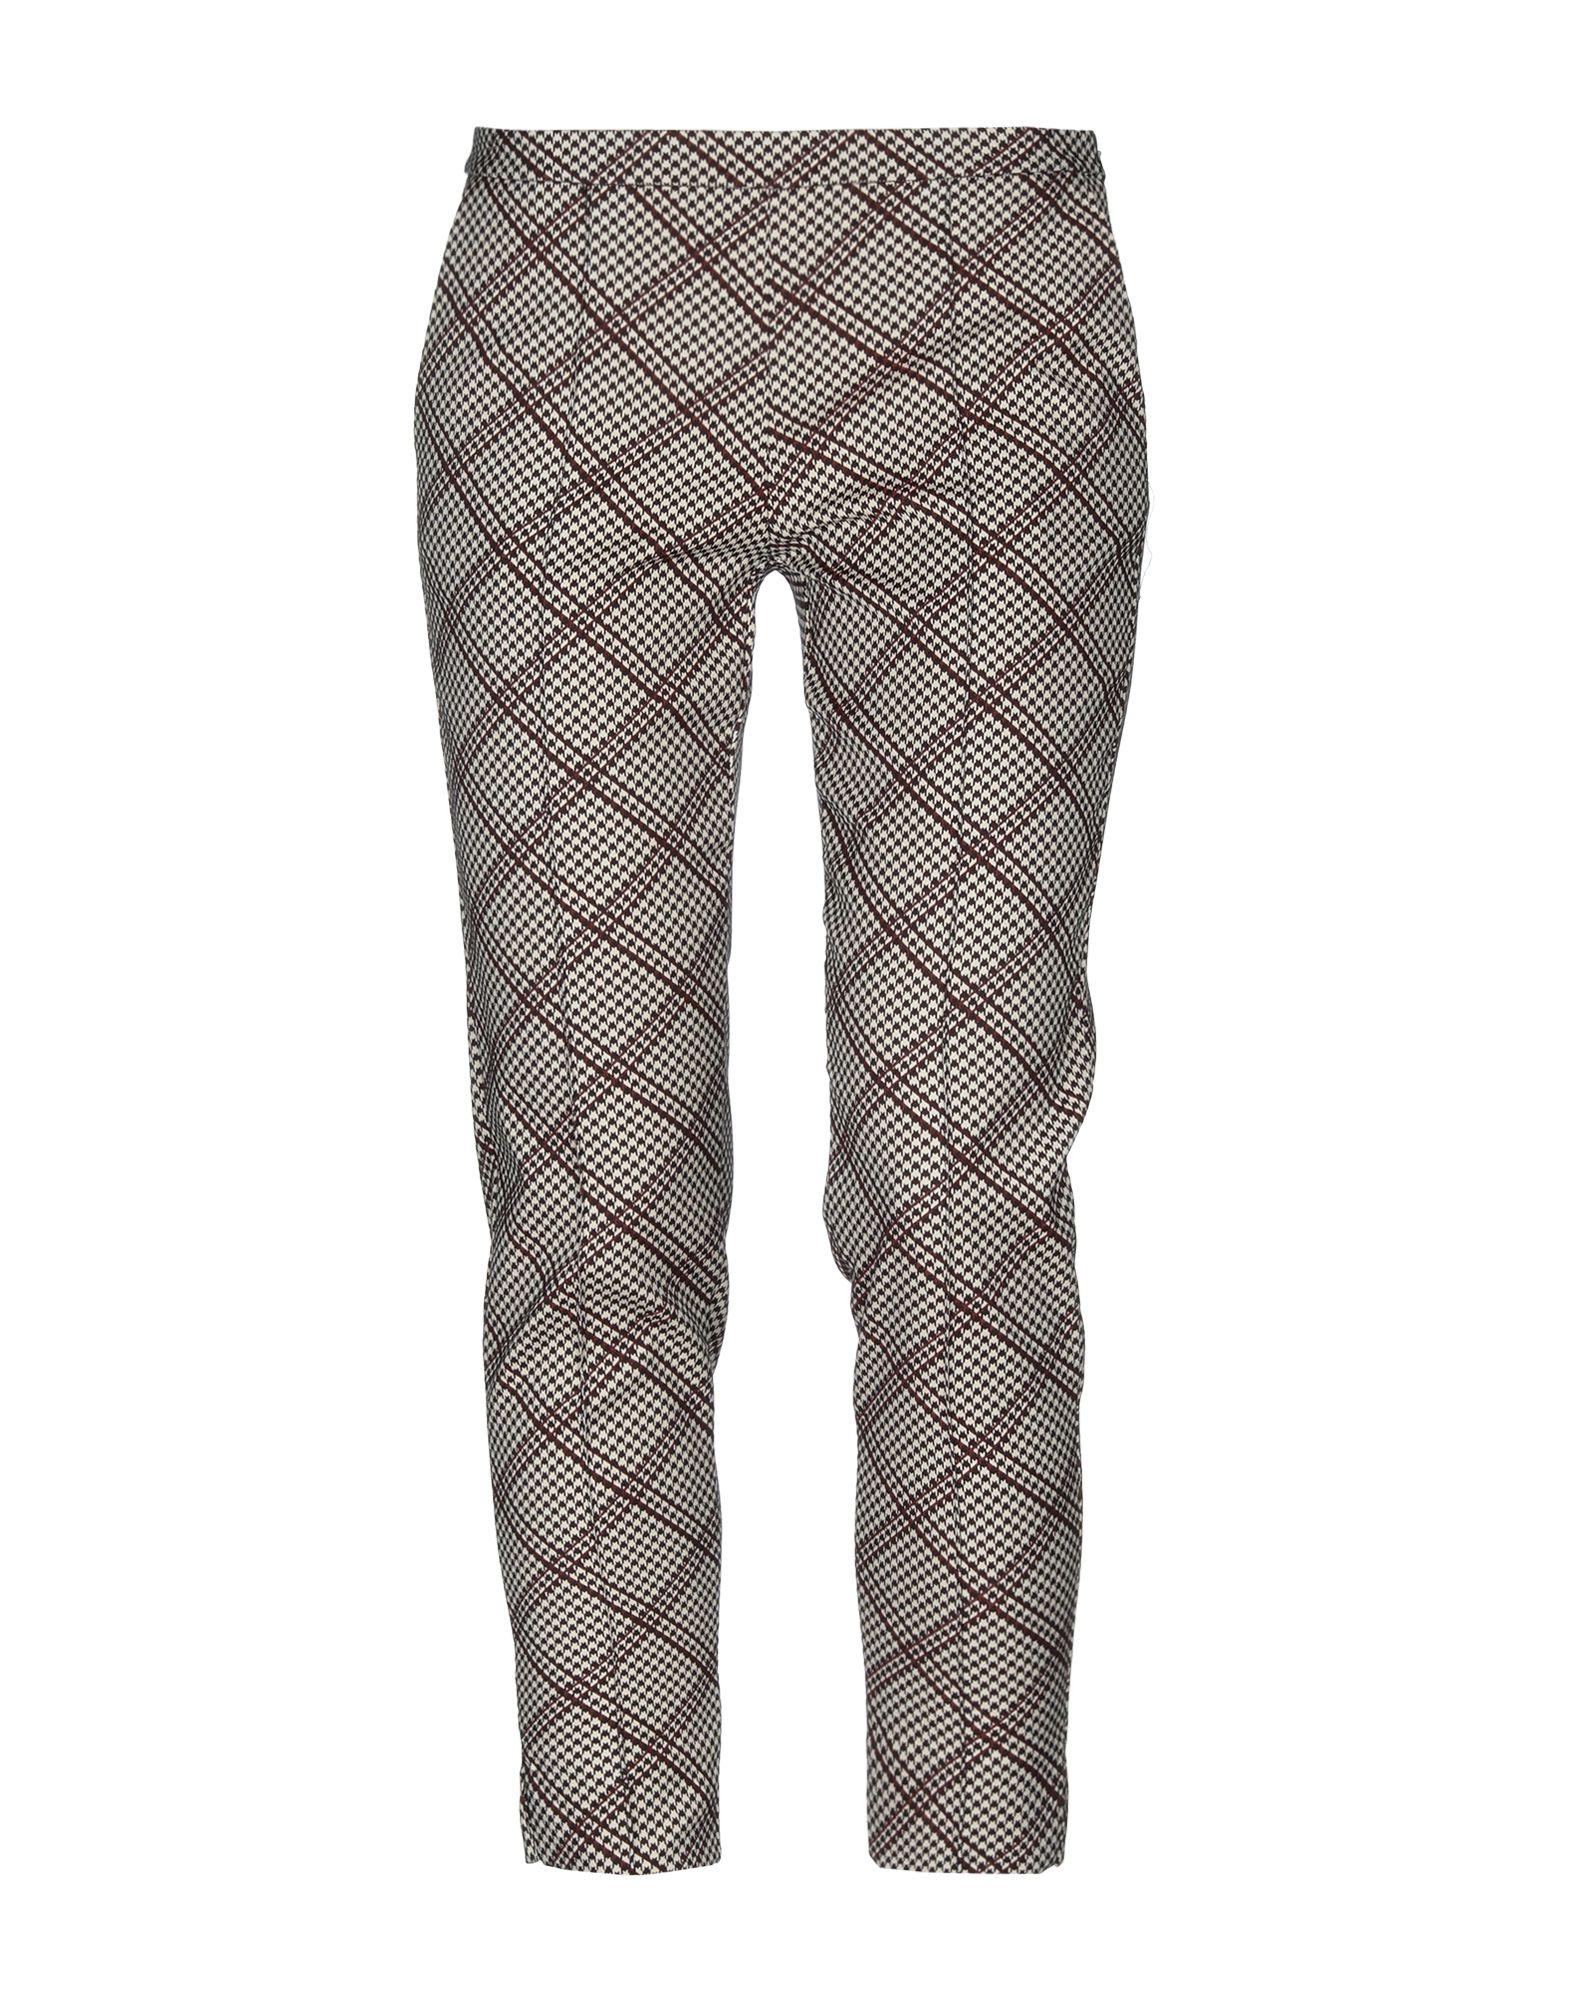 VICOLO Повседневные брюки vicolo northland повседневные брюки